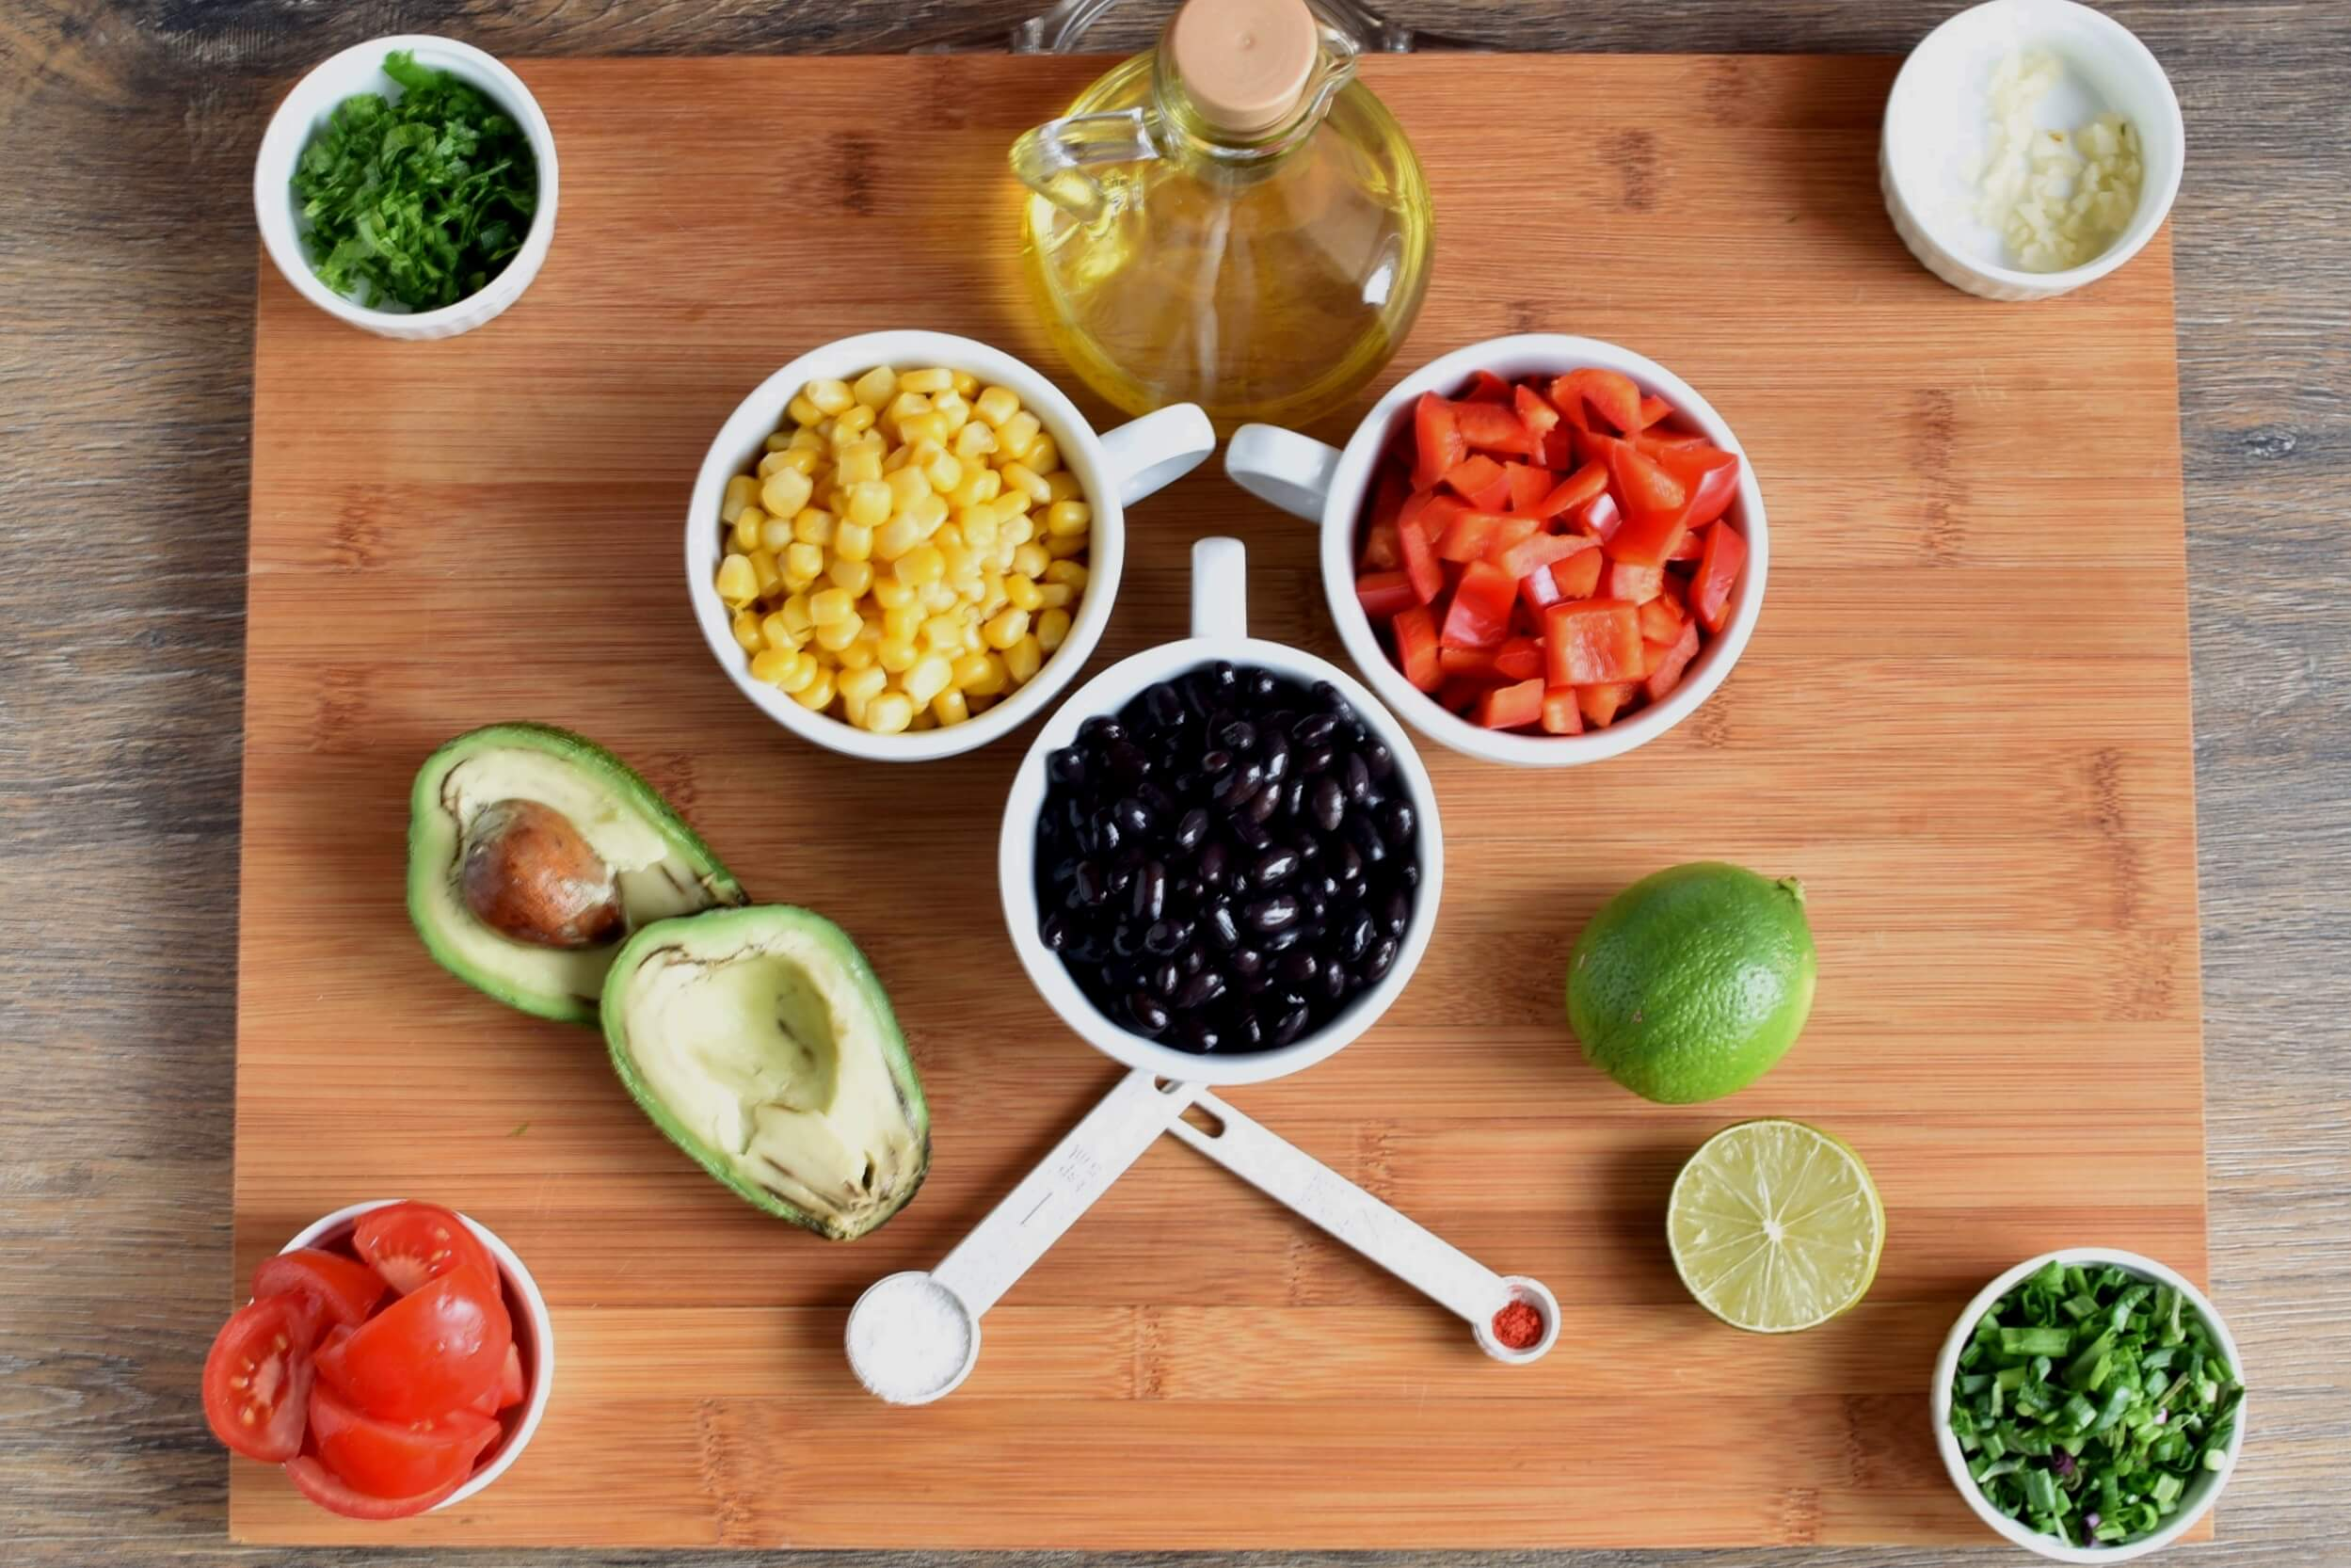 Ingridiens for Gluten Free Black Bean and Corn Salad